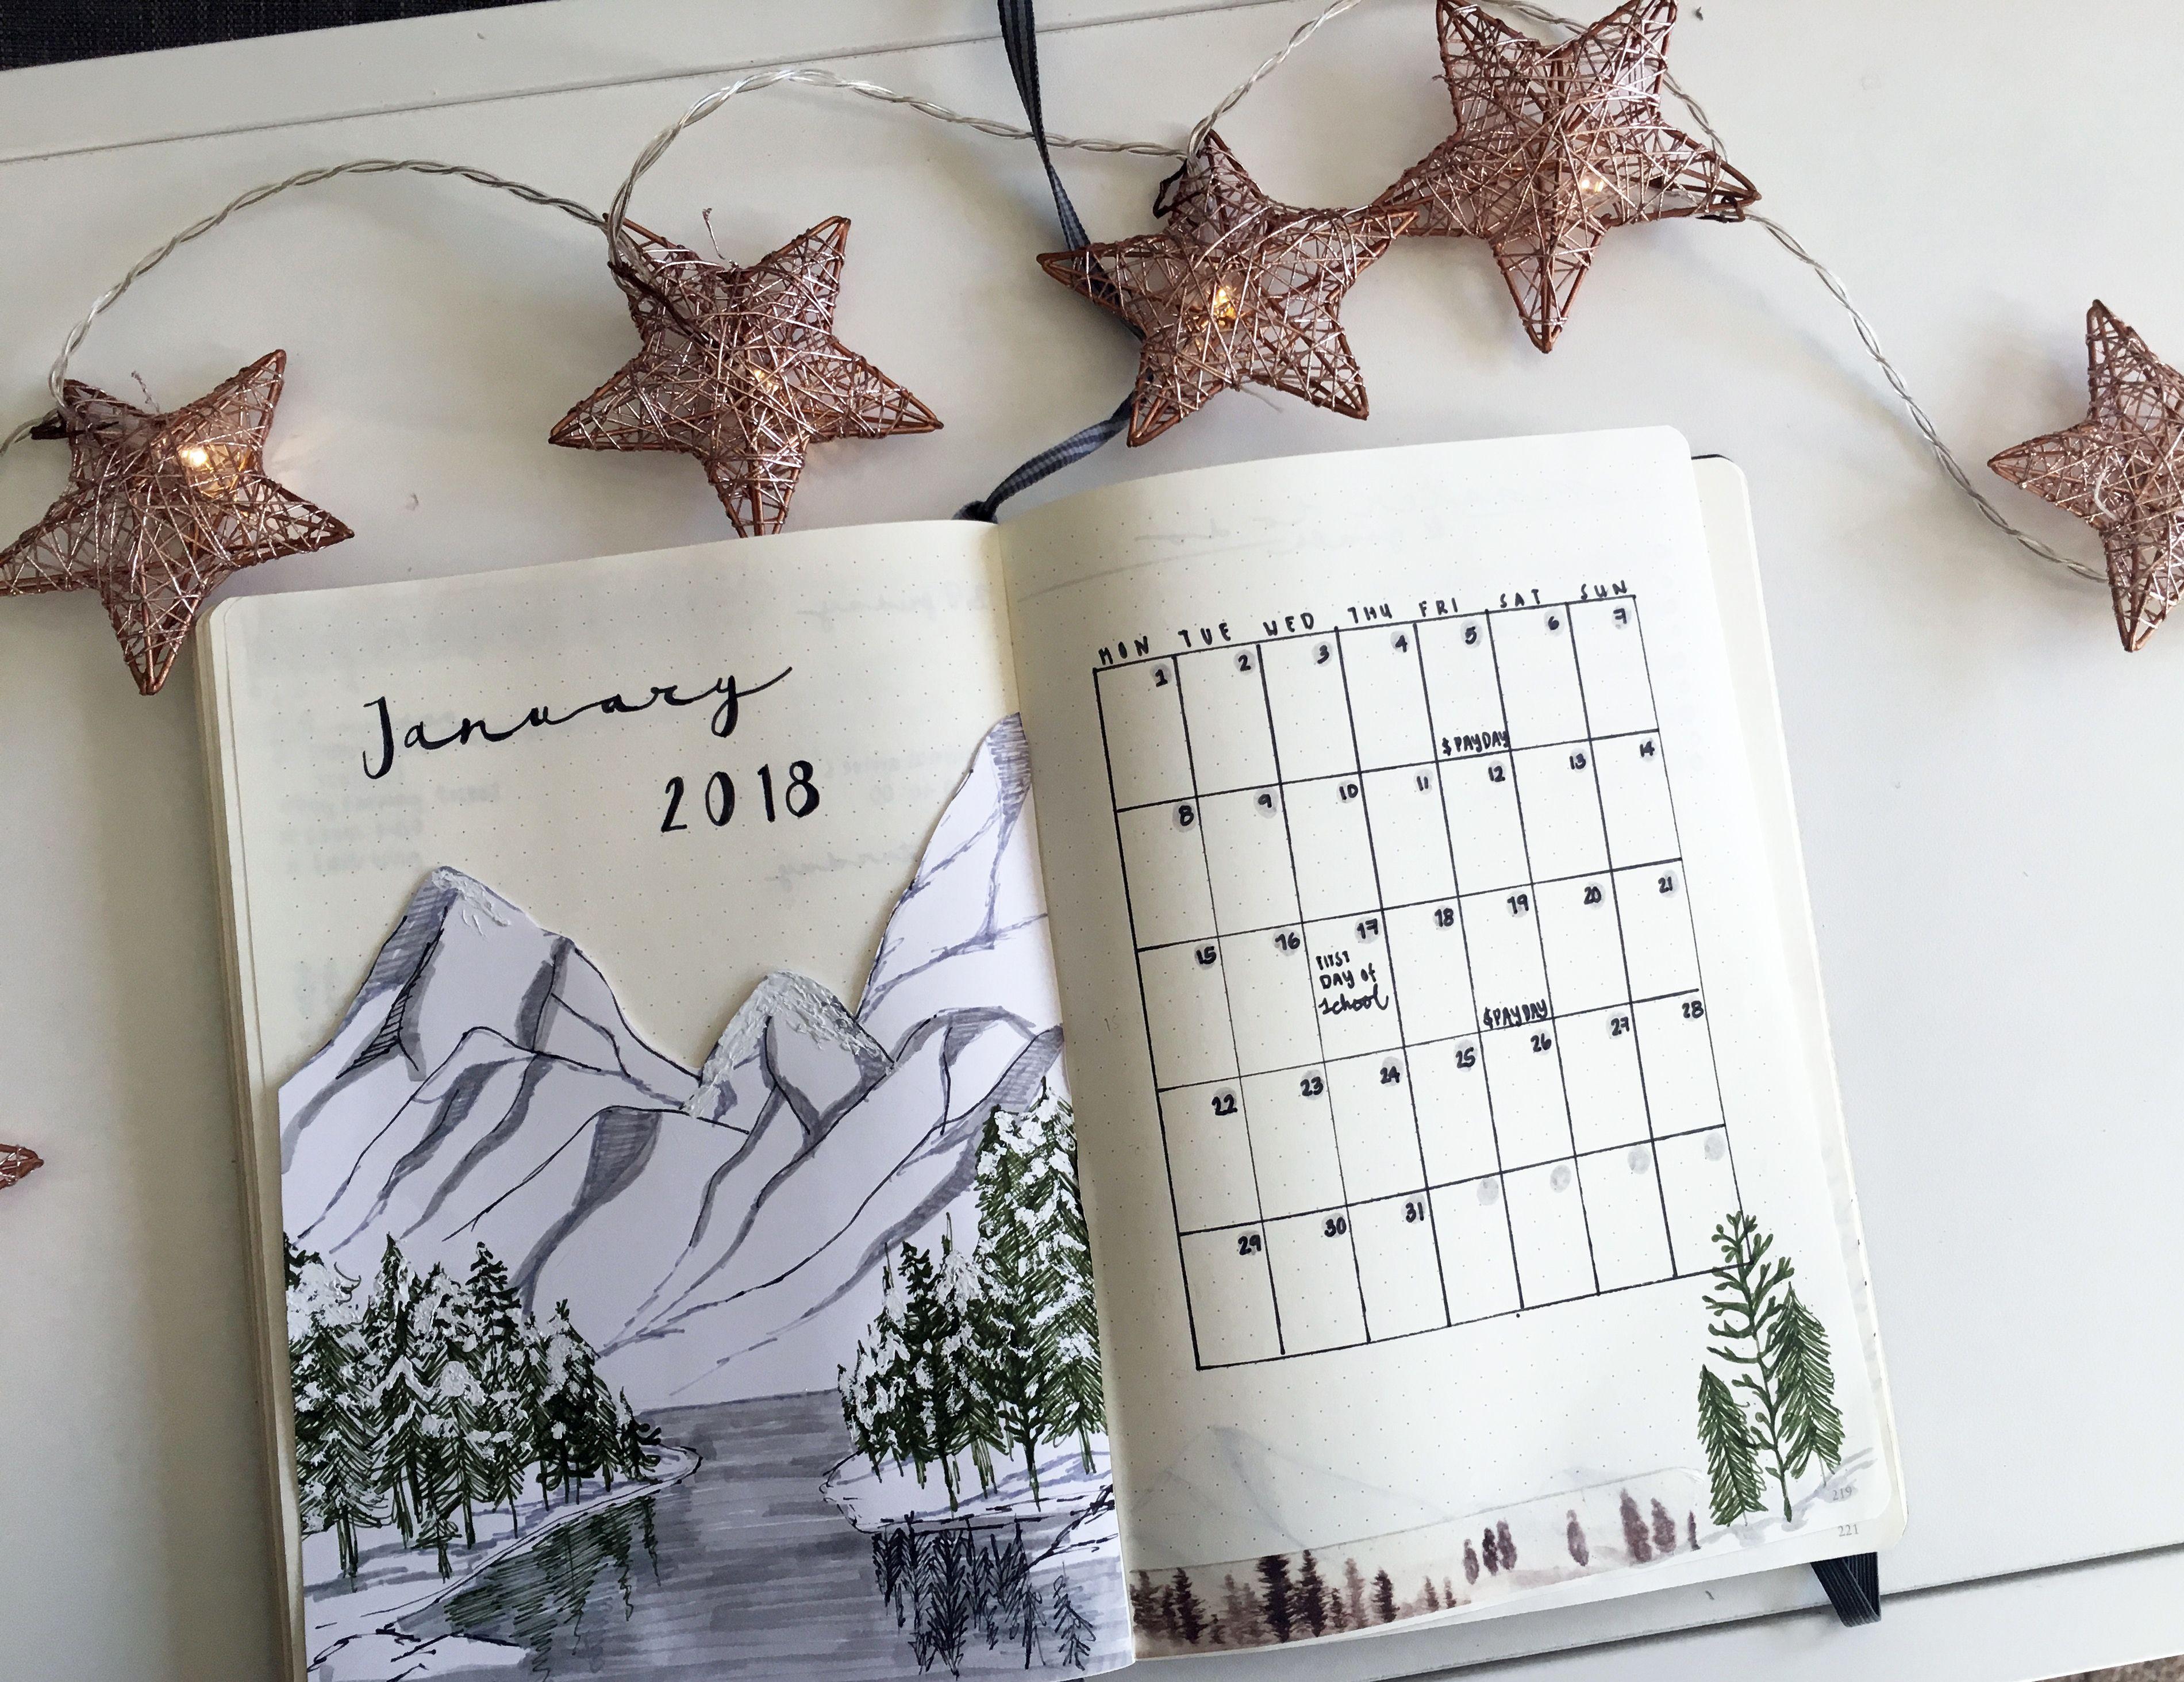 January 2018 Bullet Journal Bullet Journal Bullet Journal